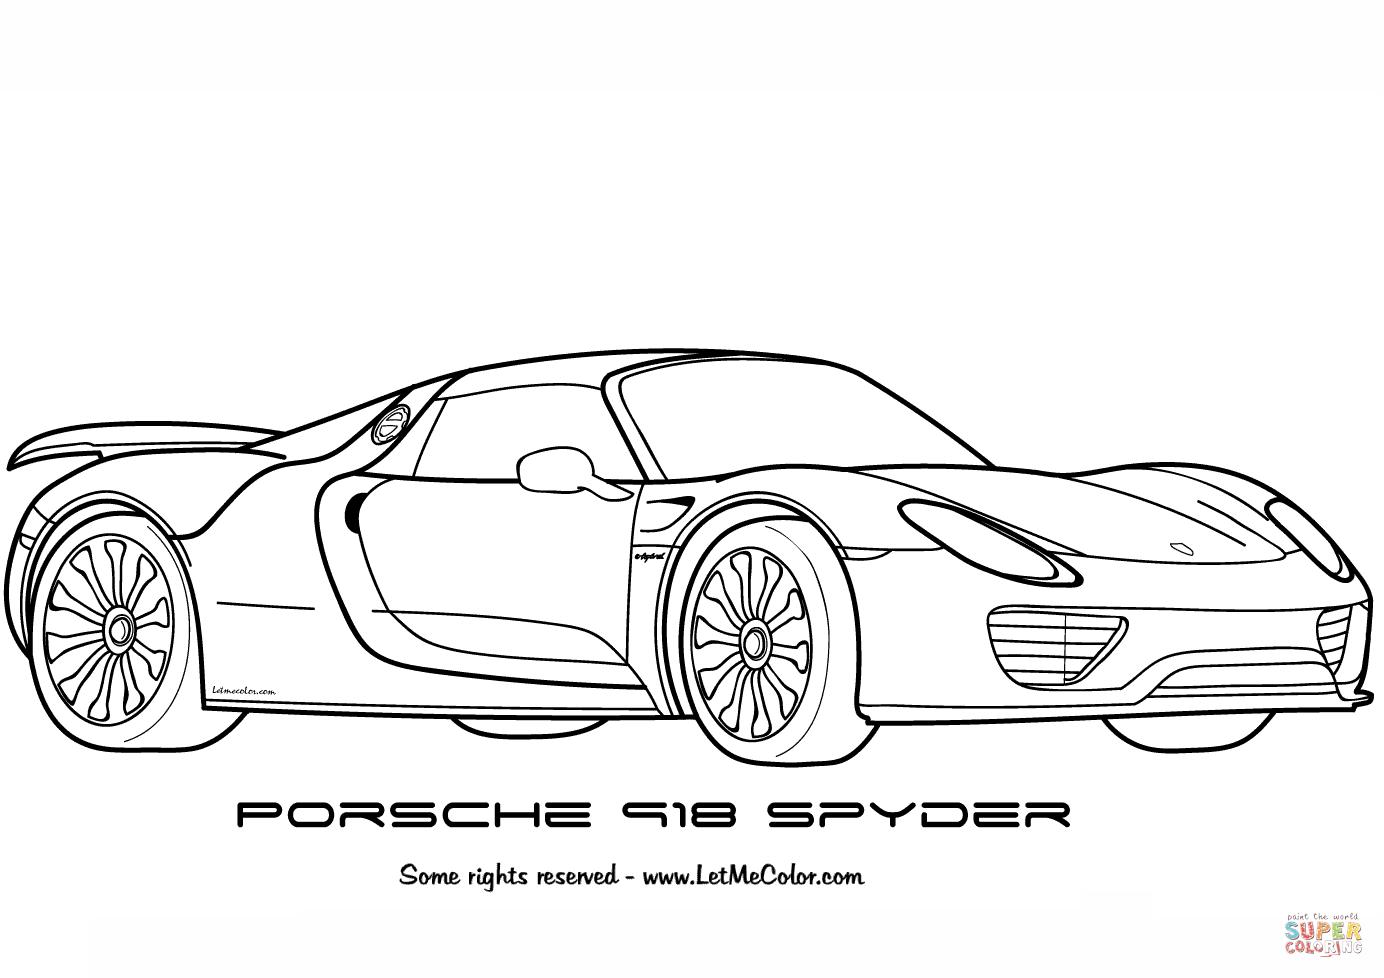 Porsche 918 Spyder Coloring Page Free Printable Coloring Pages In 2020 Cars Coloring Pages Race Car Coloring Pages Coloring Pages